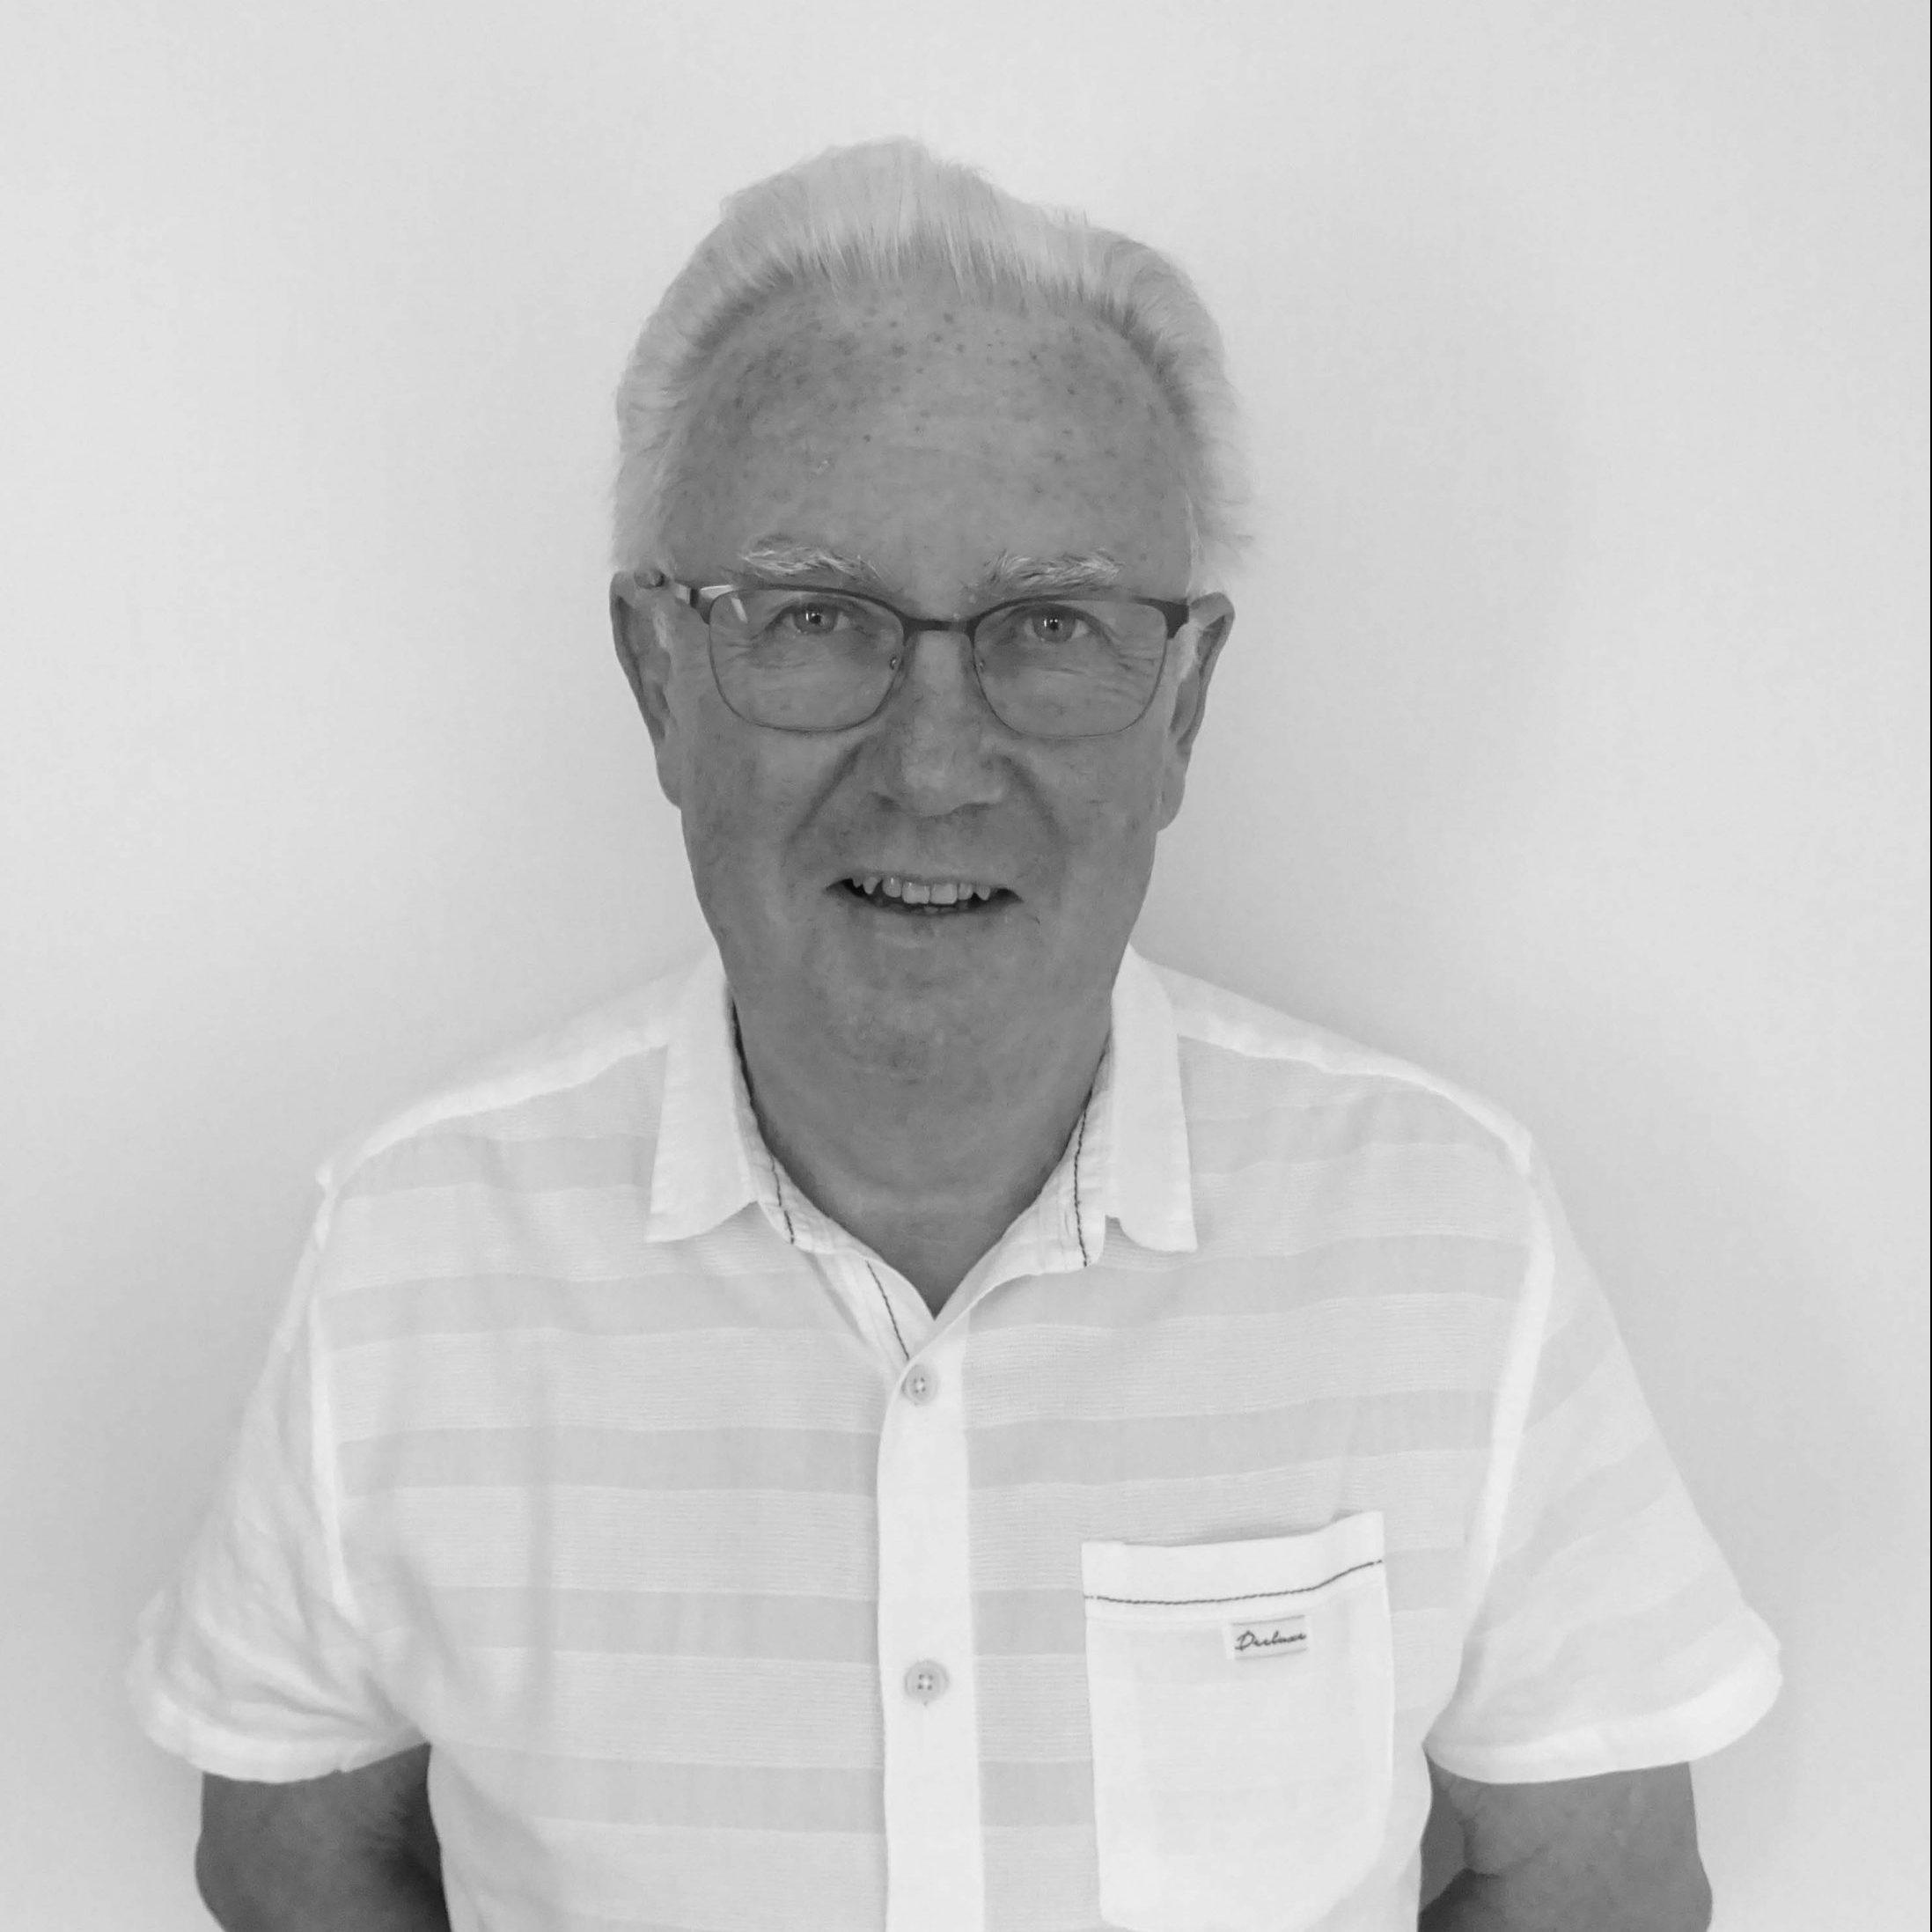 Jean-Luc Dubois